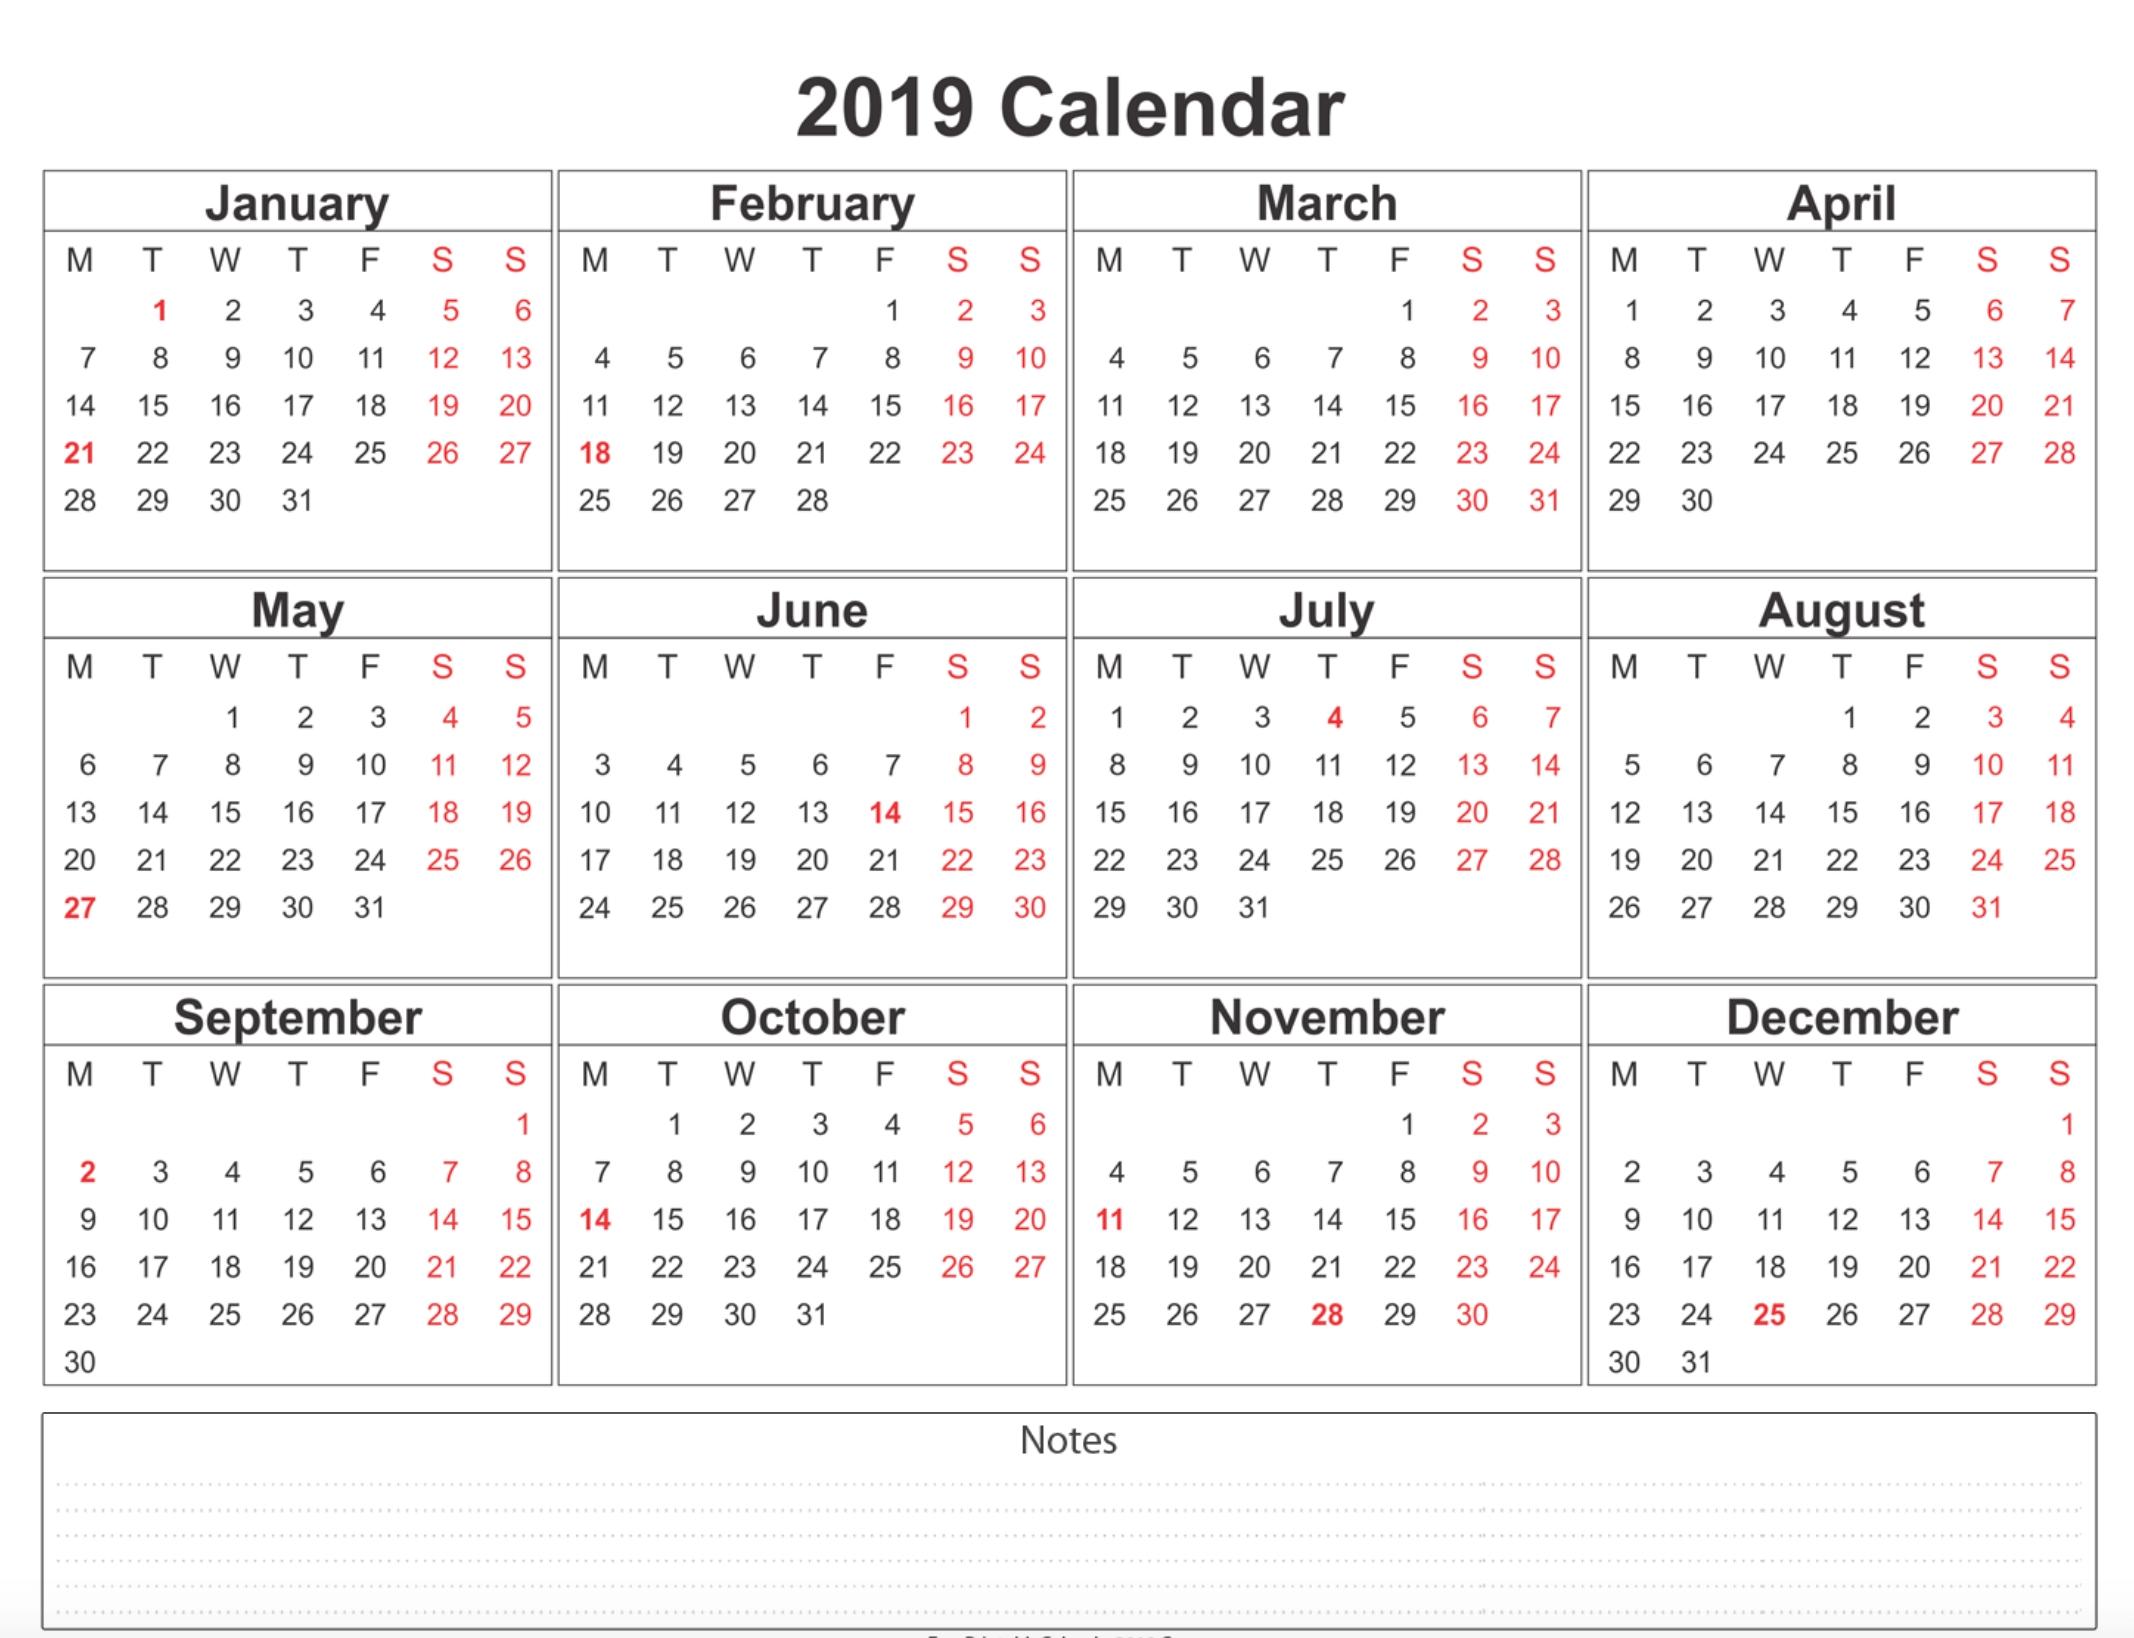 Free Printable Calendar 2019 With Holidays | Blank 12 Month Calendar Calendar 2019 Excel Free